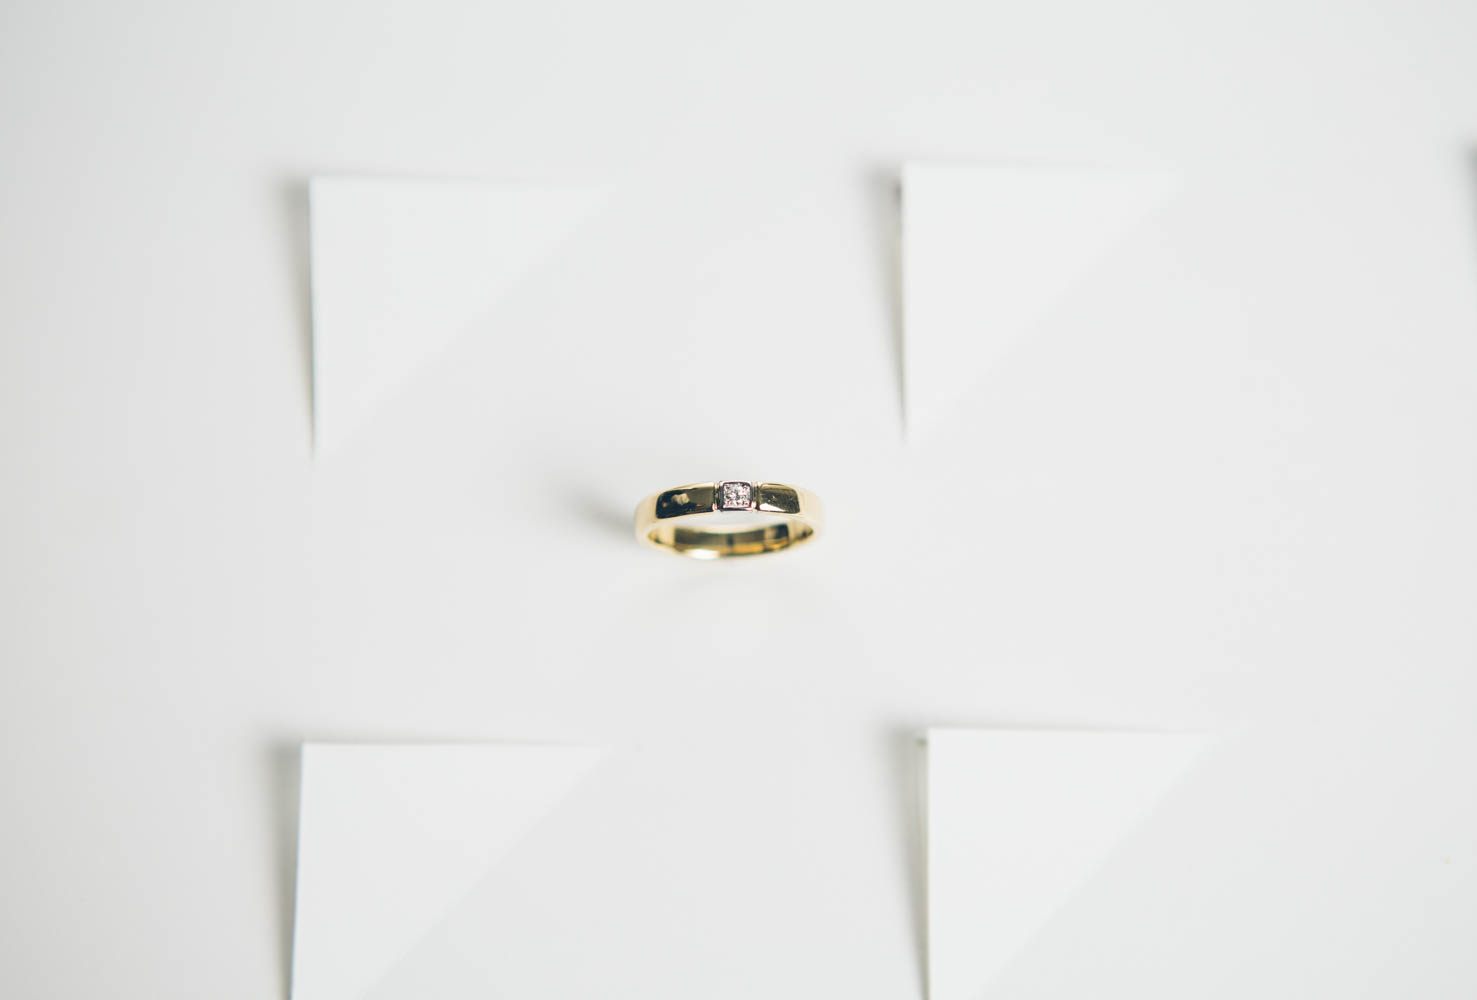 Shiny - Solitario White & Gold